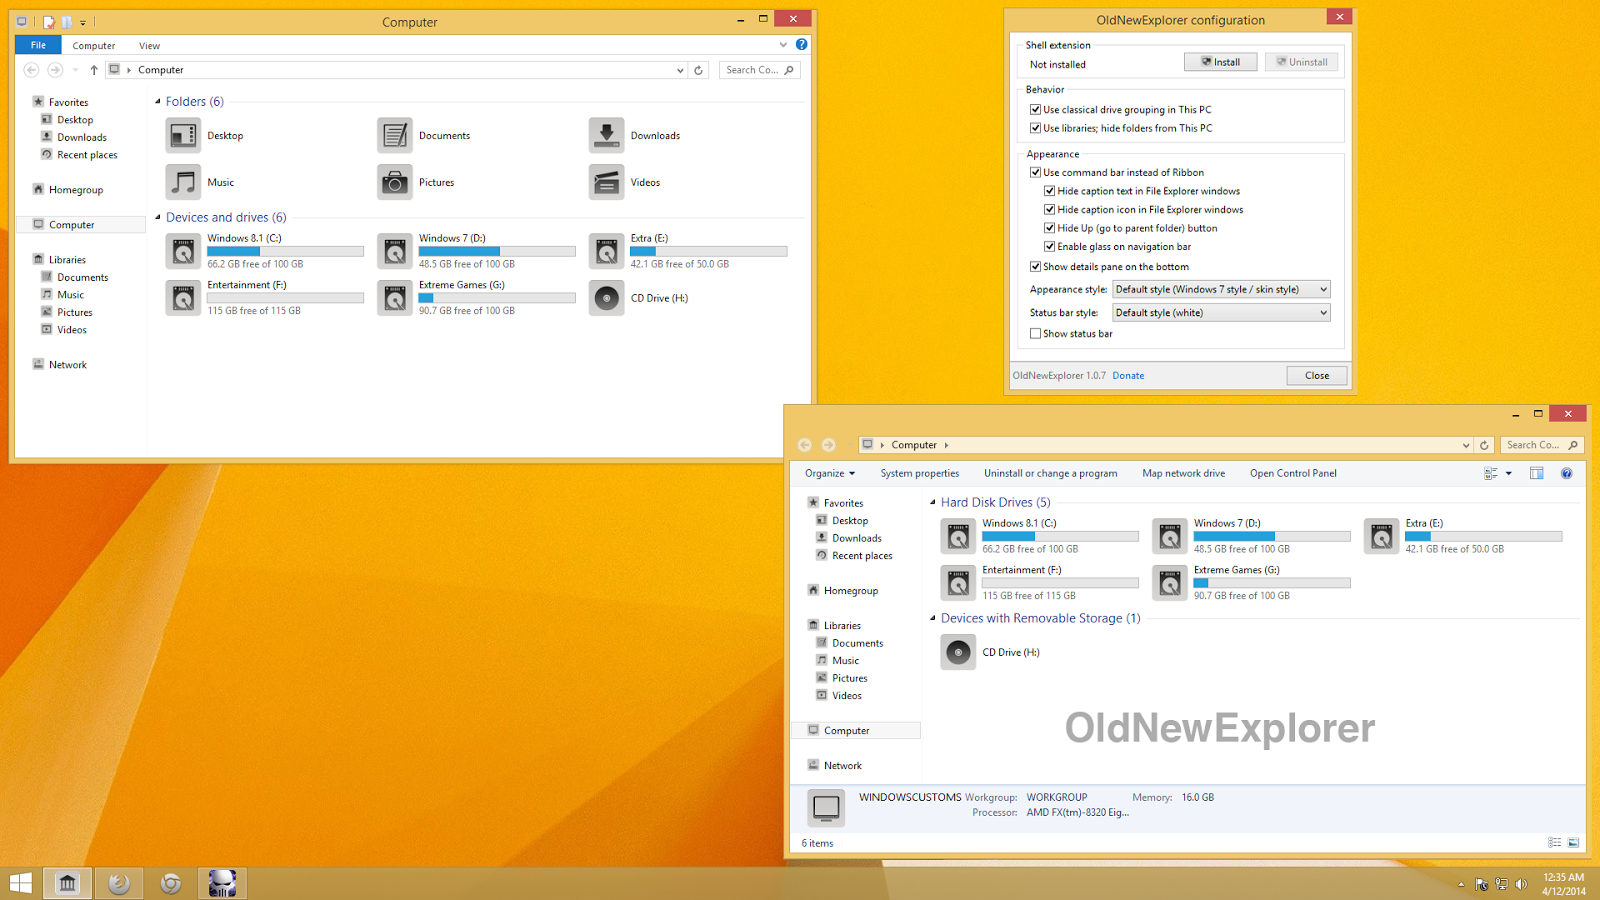 Windows Customs: How To Make Windows 8/8.1/10 Explorer ...